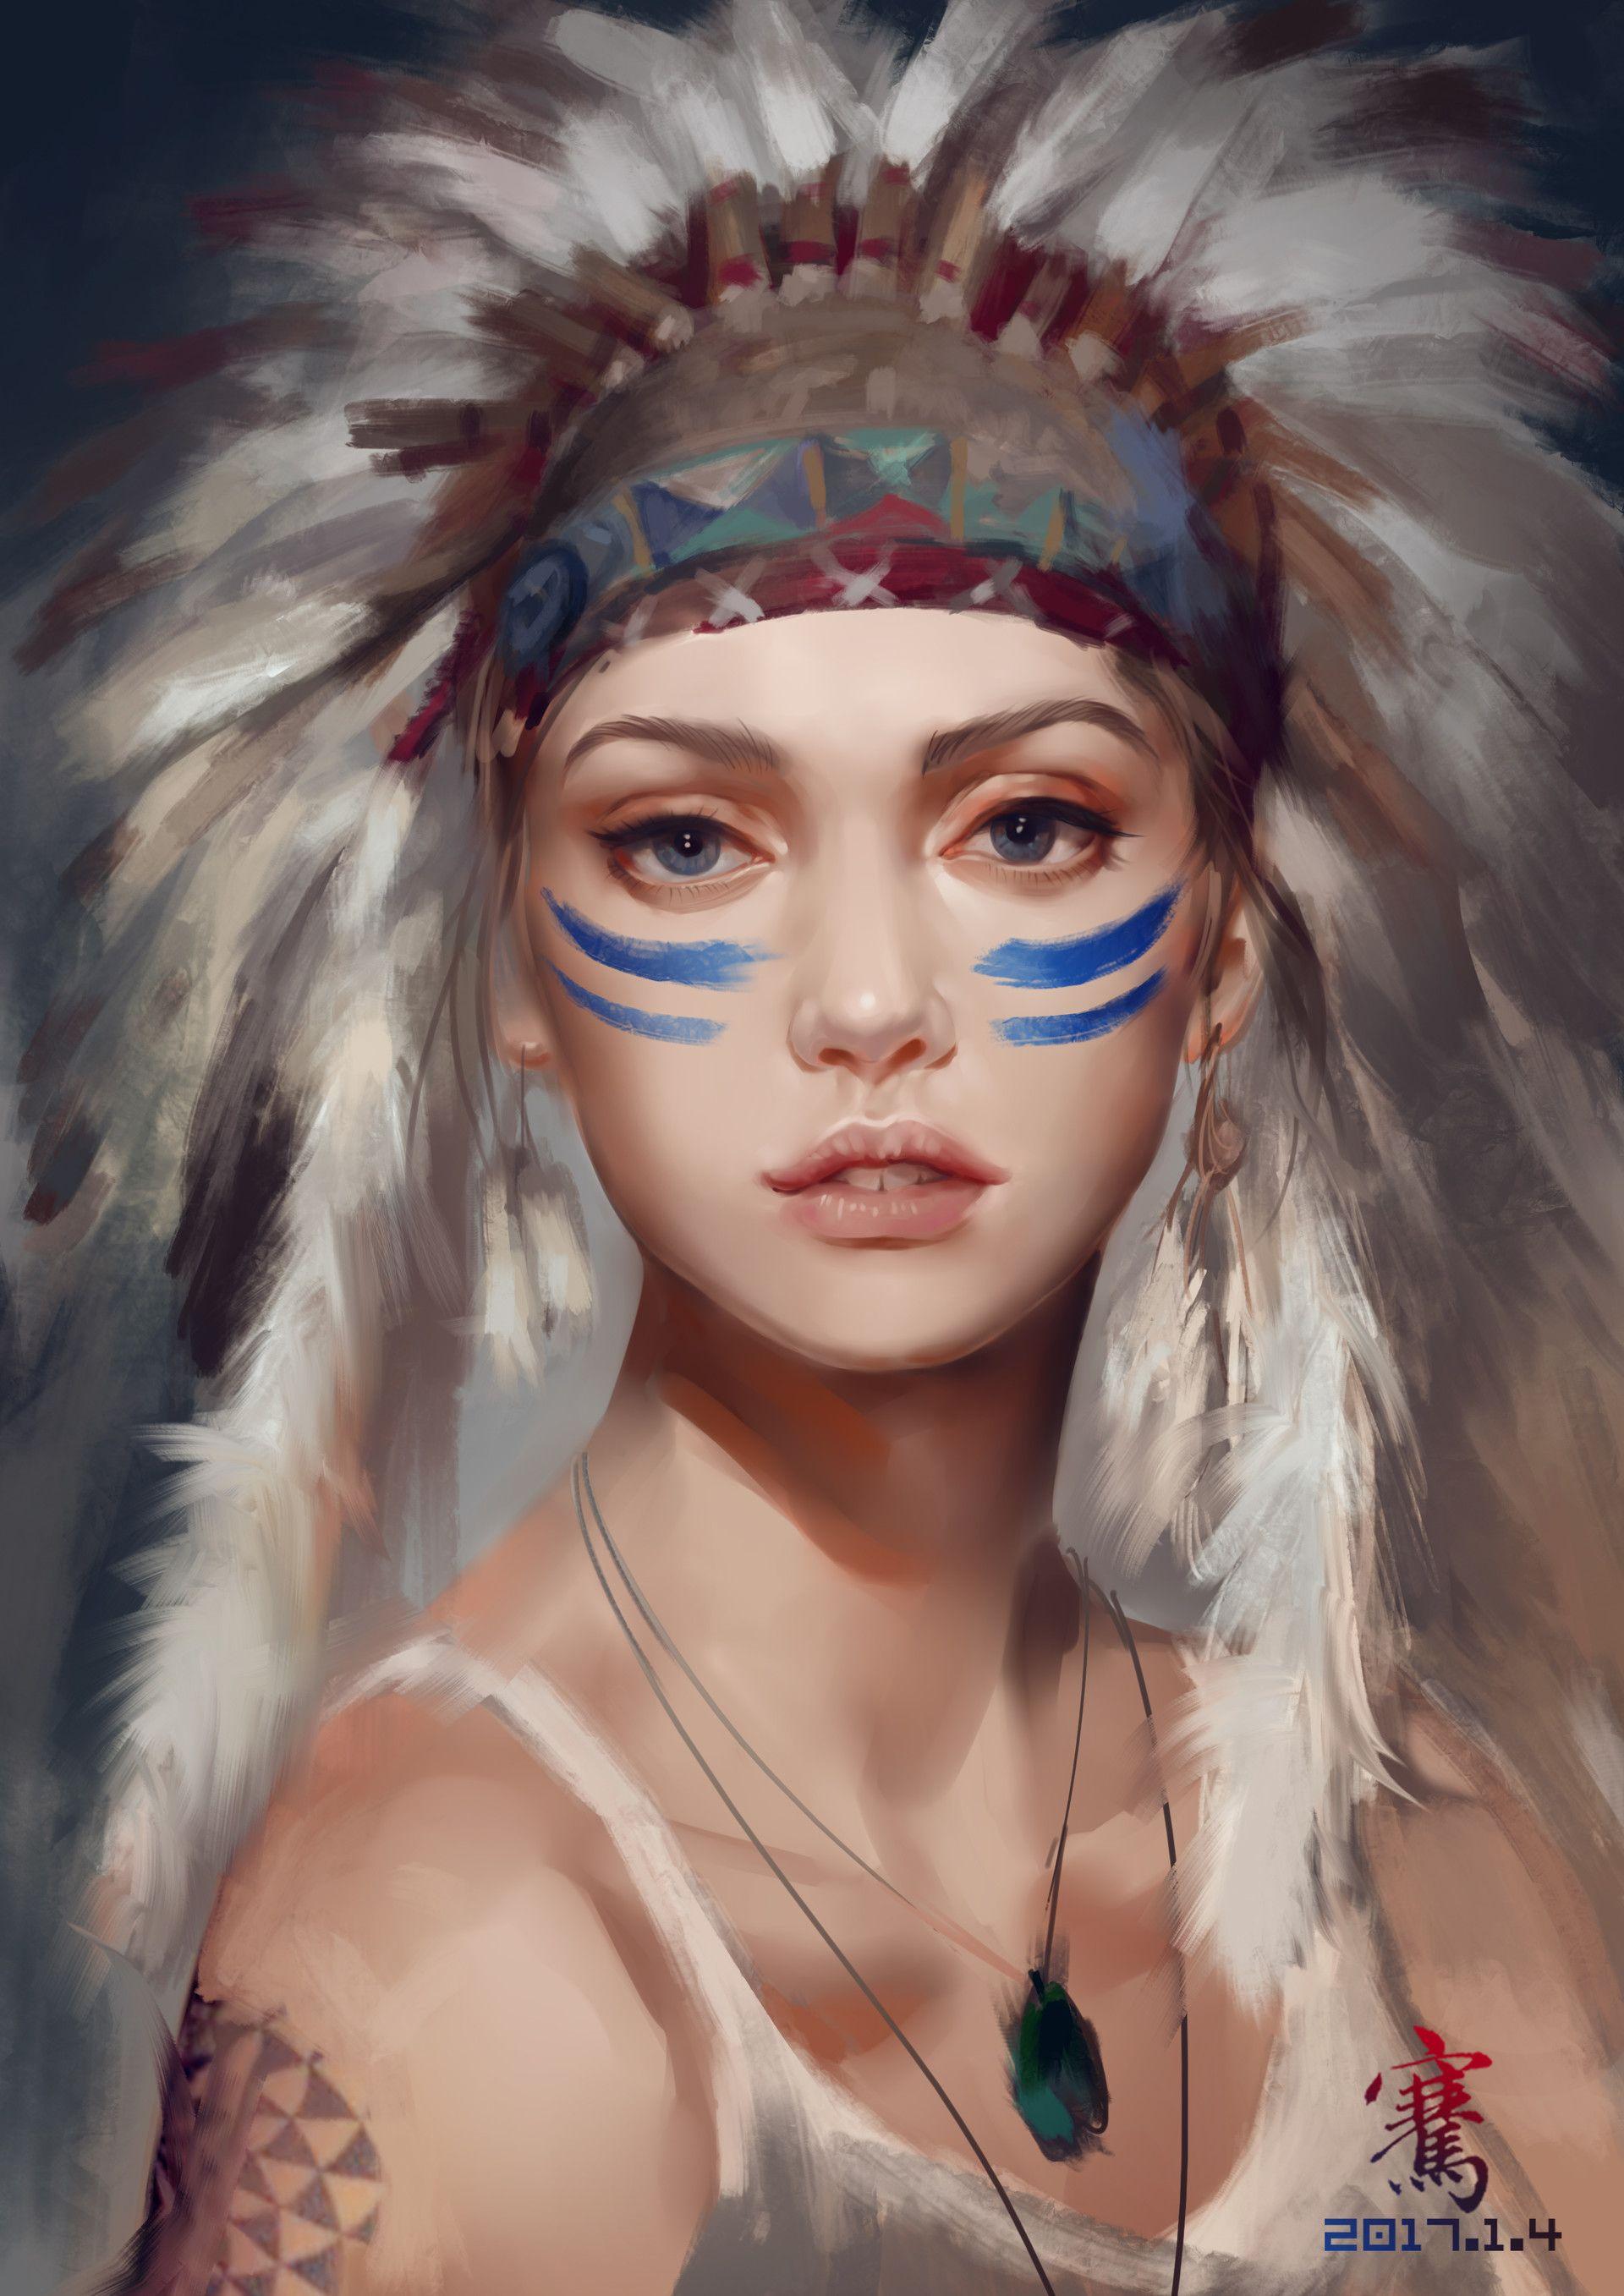 ArtStation Indian girl!, liang qian Characters 9